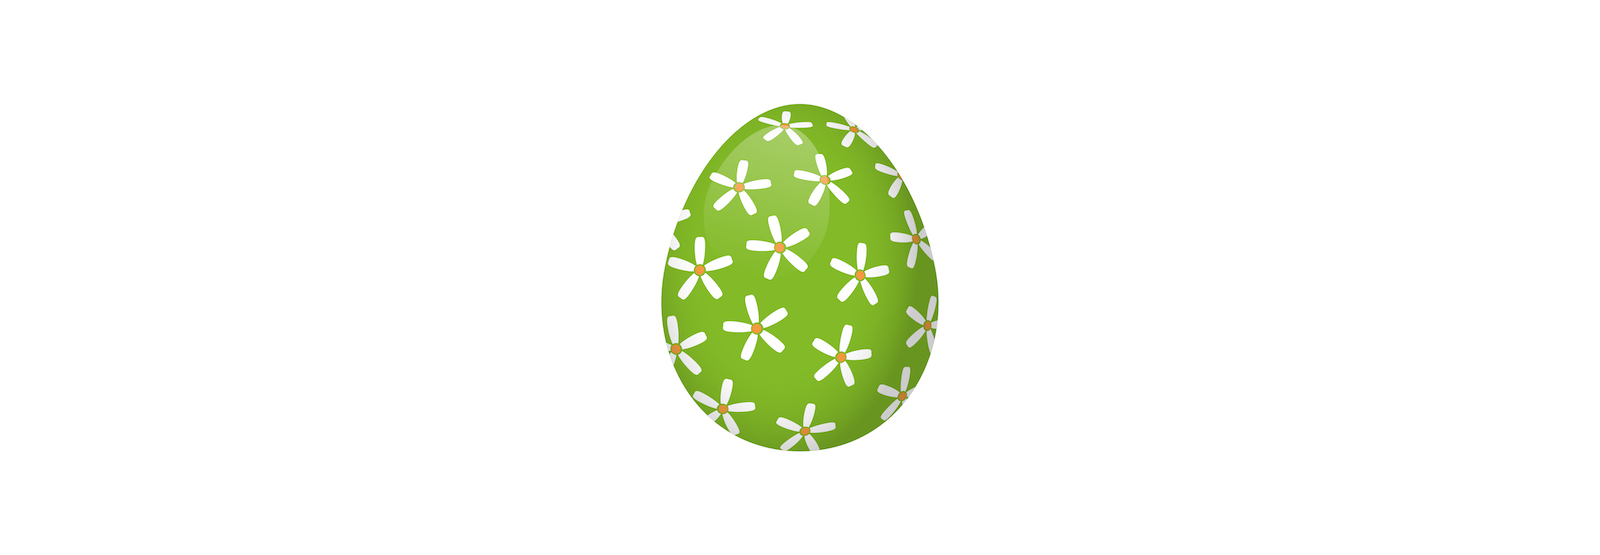 Oster-Aktion, finde alle fünf Eier